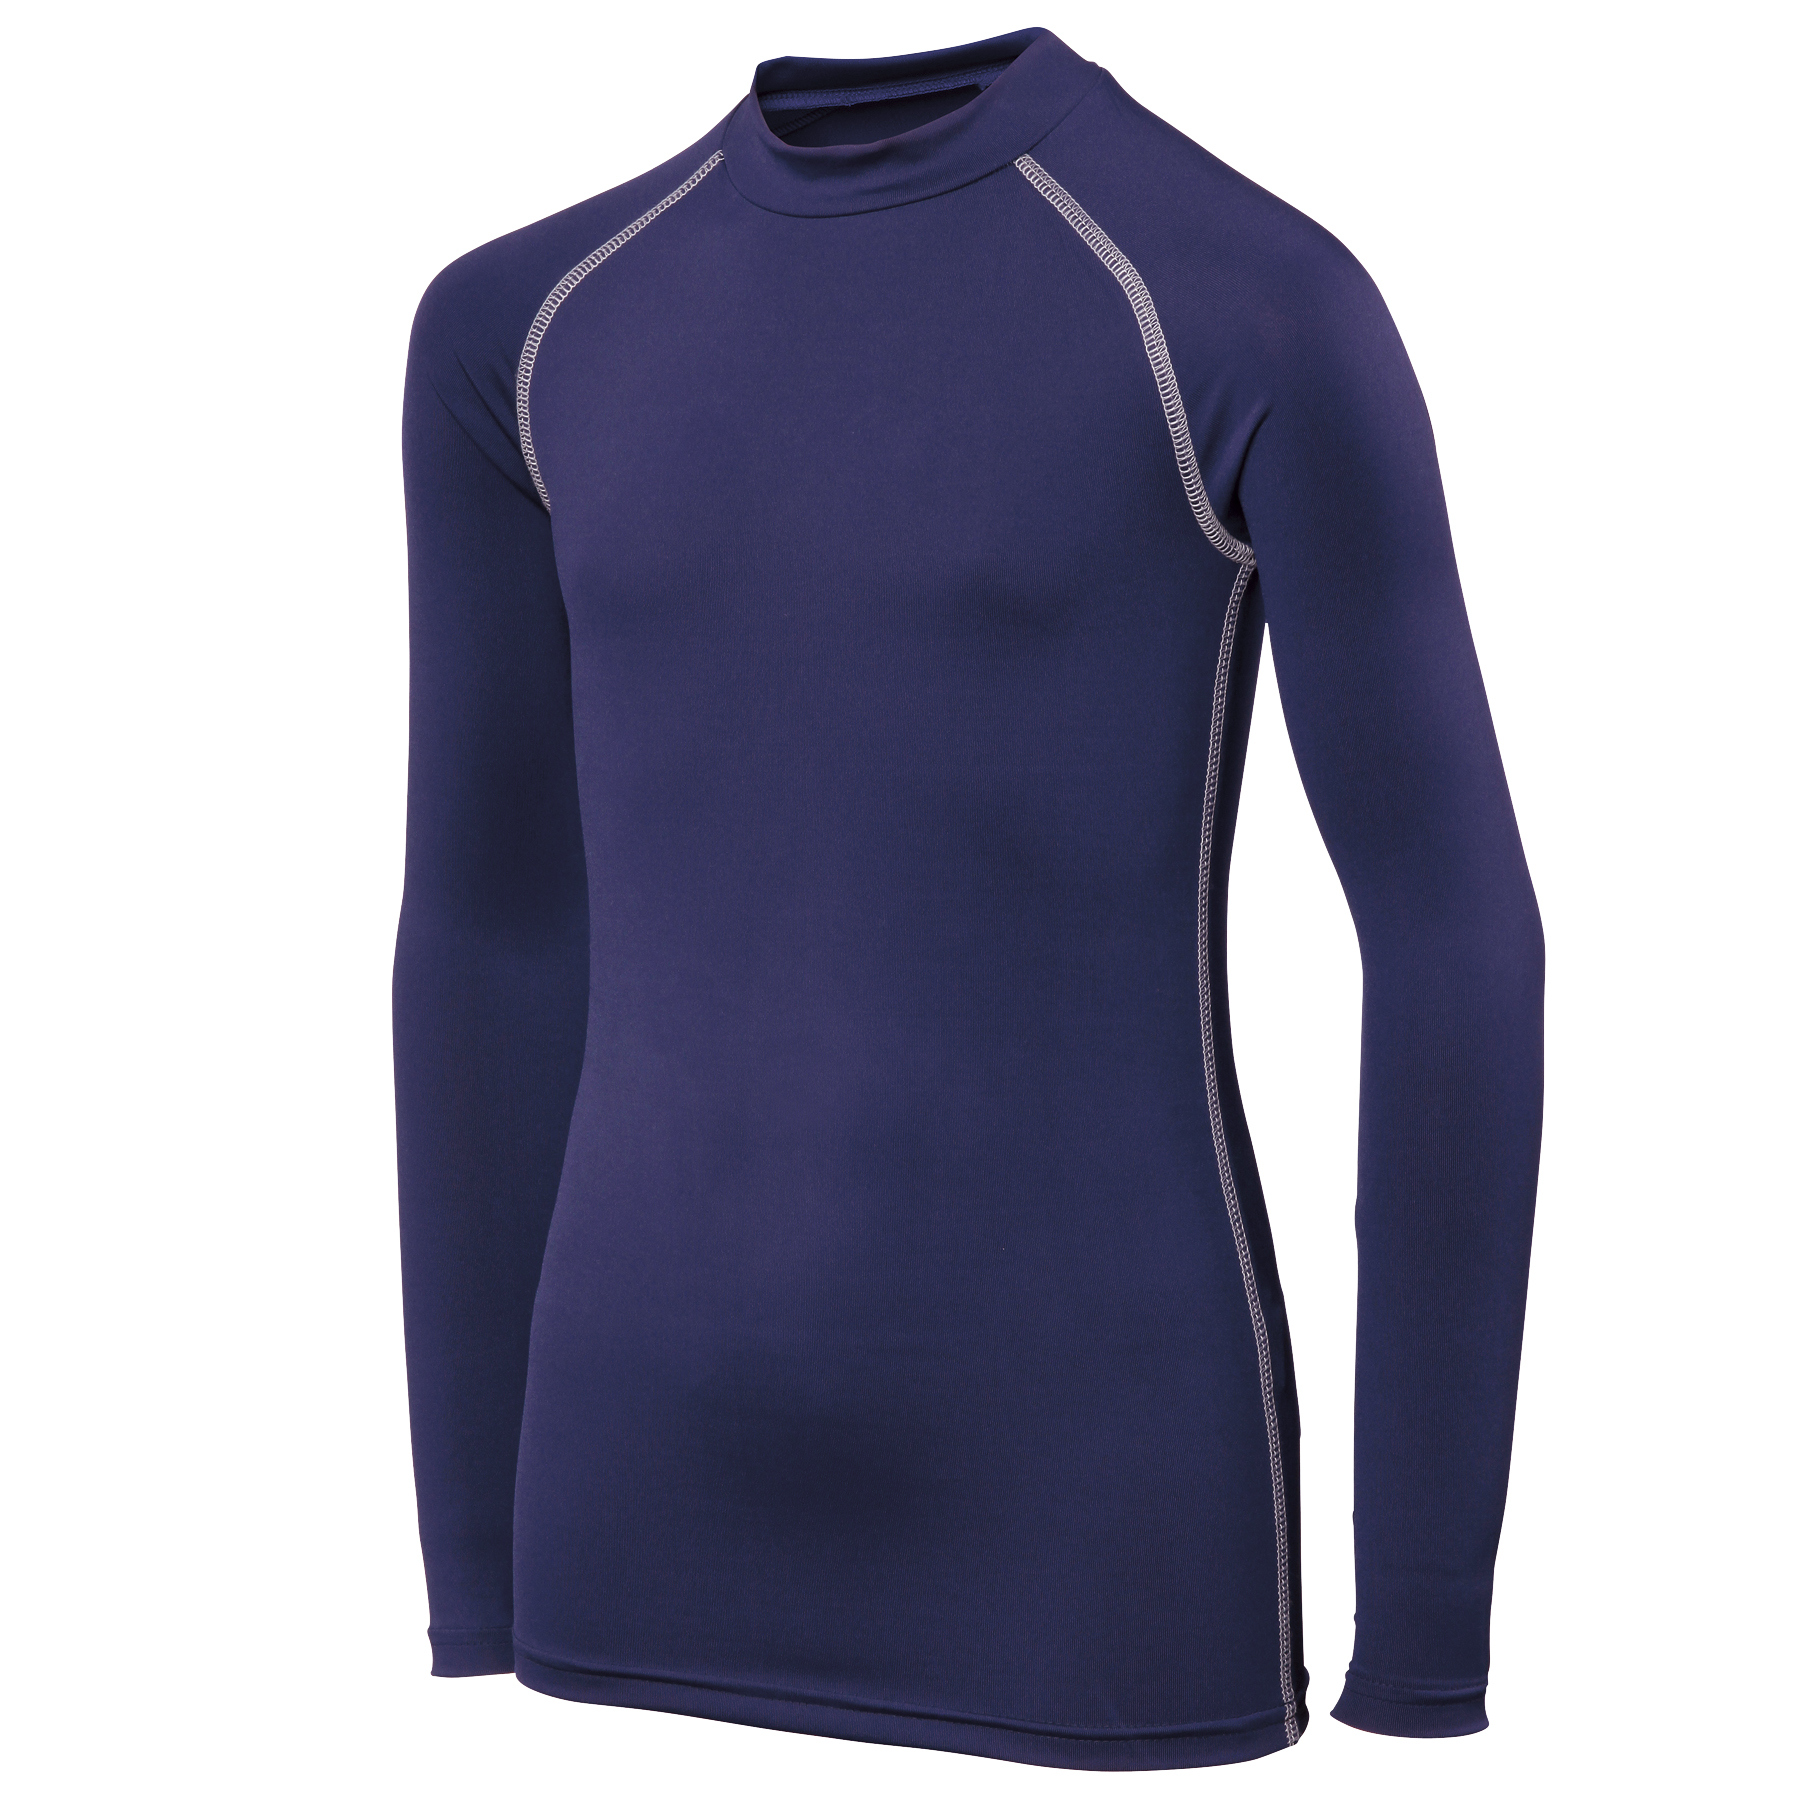 Rhino Childrens Boys Long Sleeve Thermal Underwear Base Layer Vest Top (5-6) (Navy)